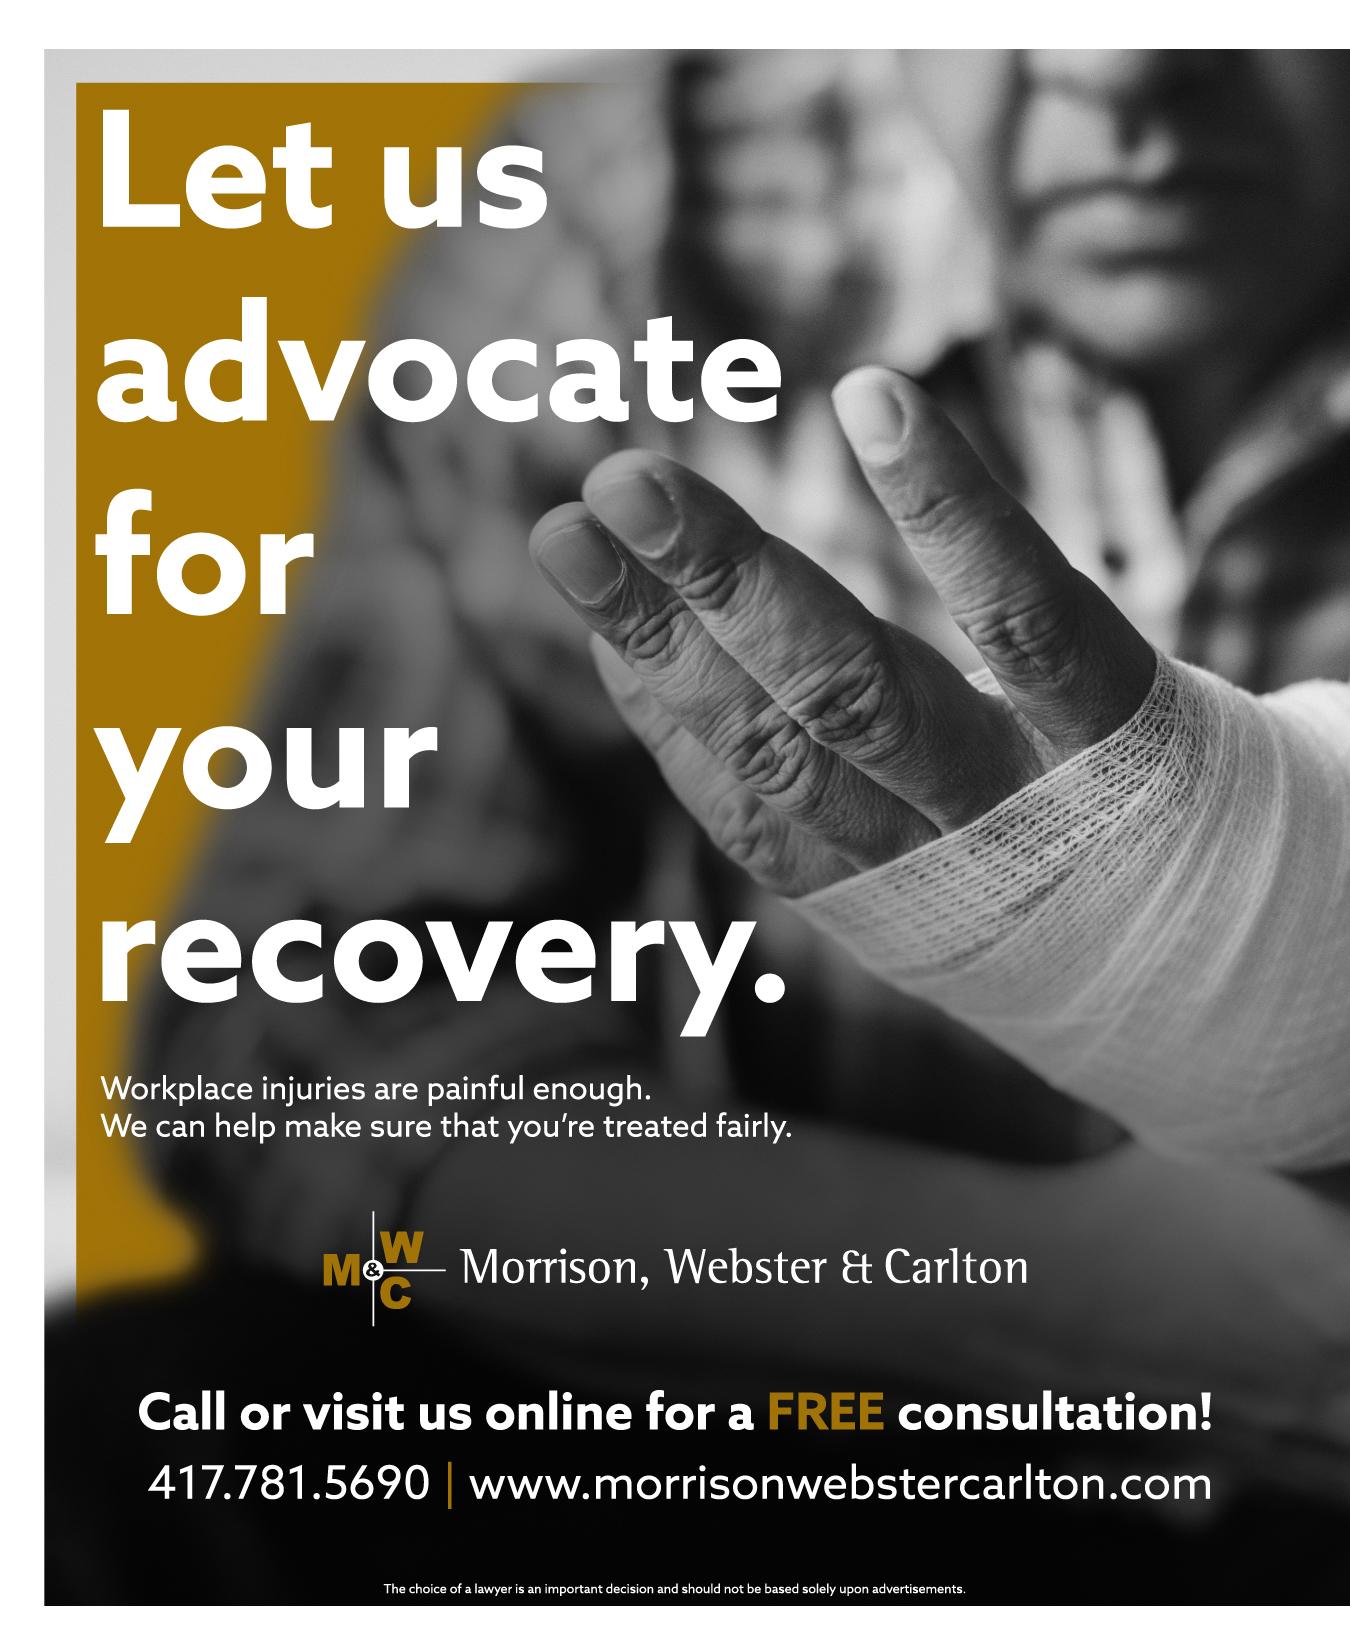 Morrison Webster Carlton Advertisement Graphic Design